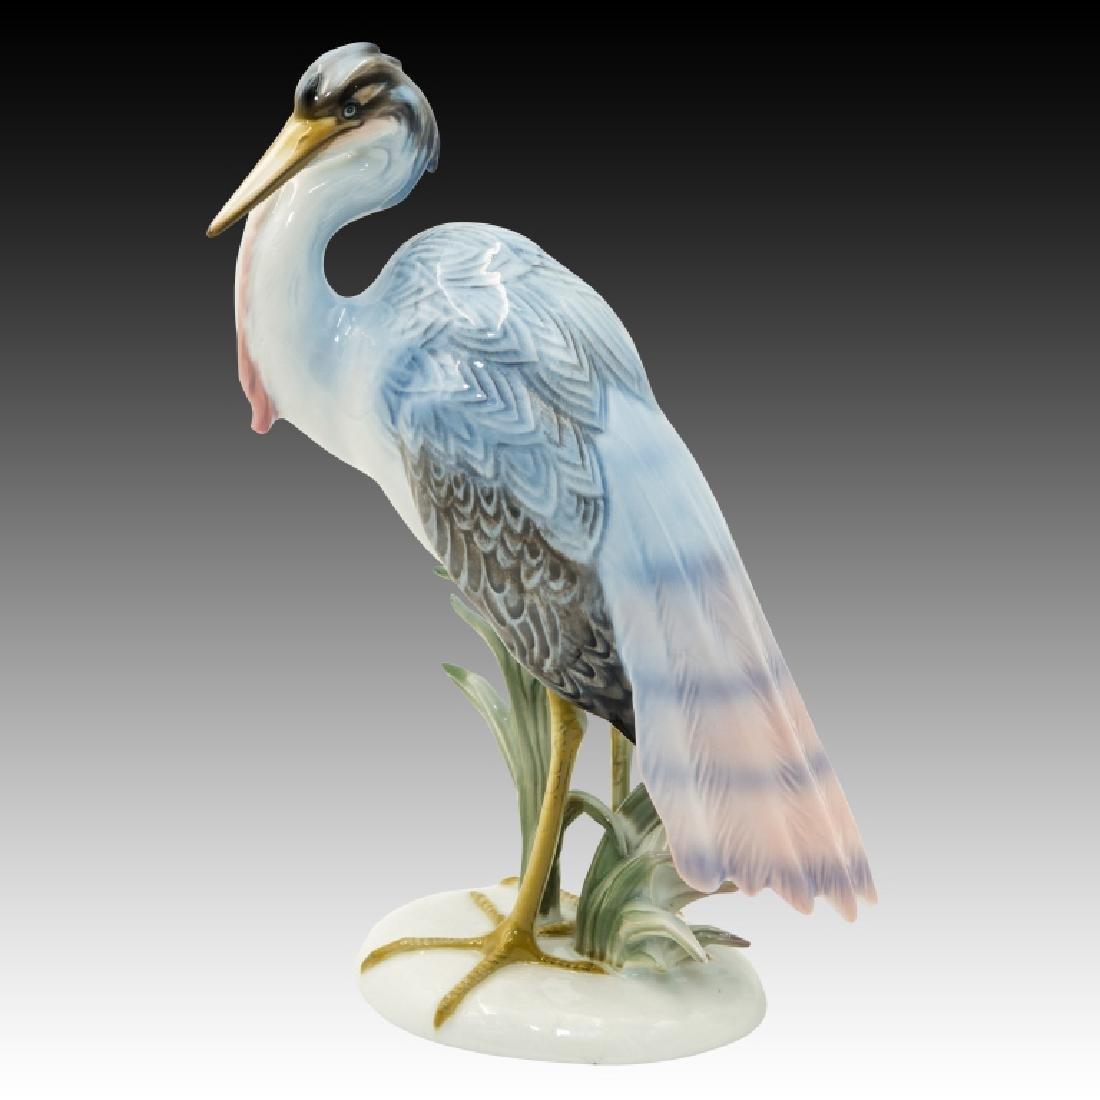 Rosenthal Large Heron Figurine